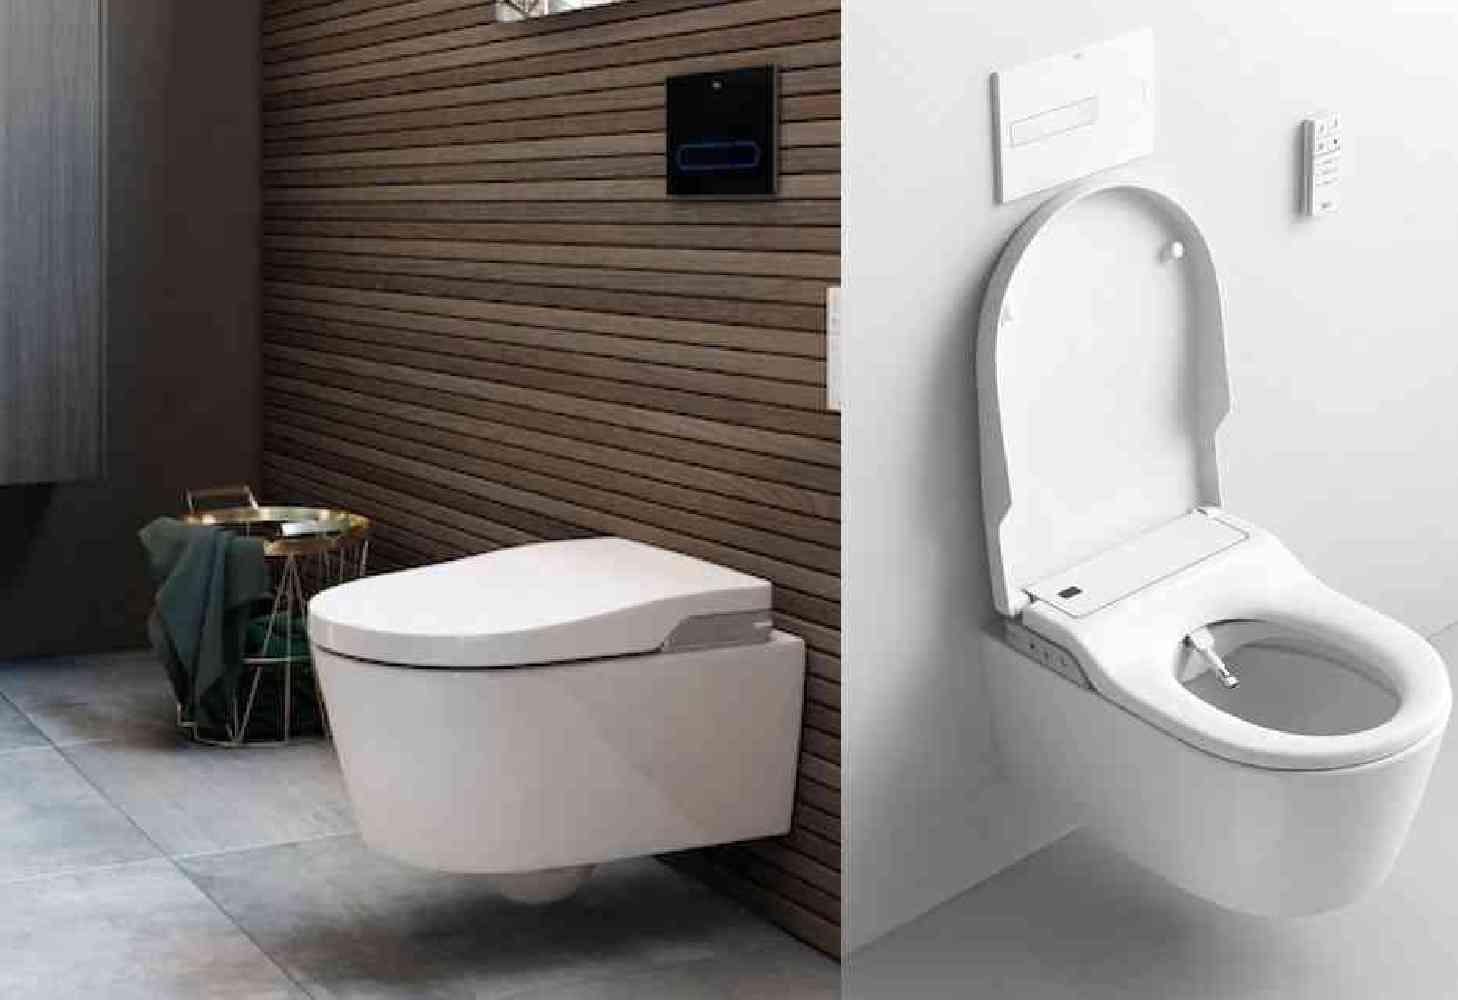 wc japonais lavant suspendu in wash inspira roca